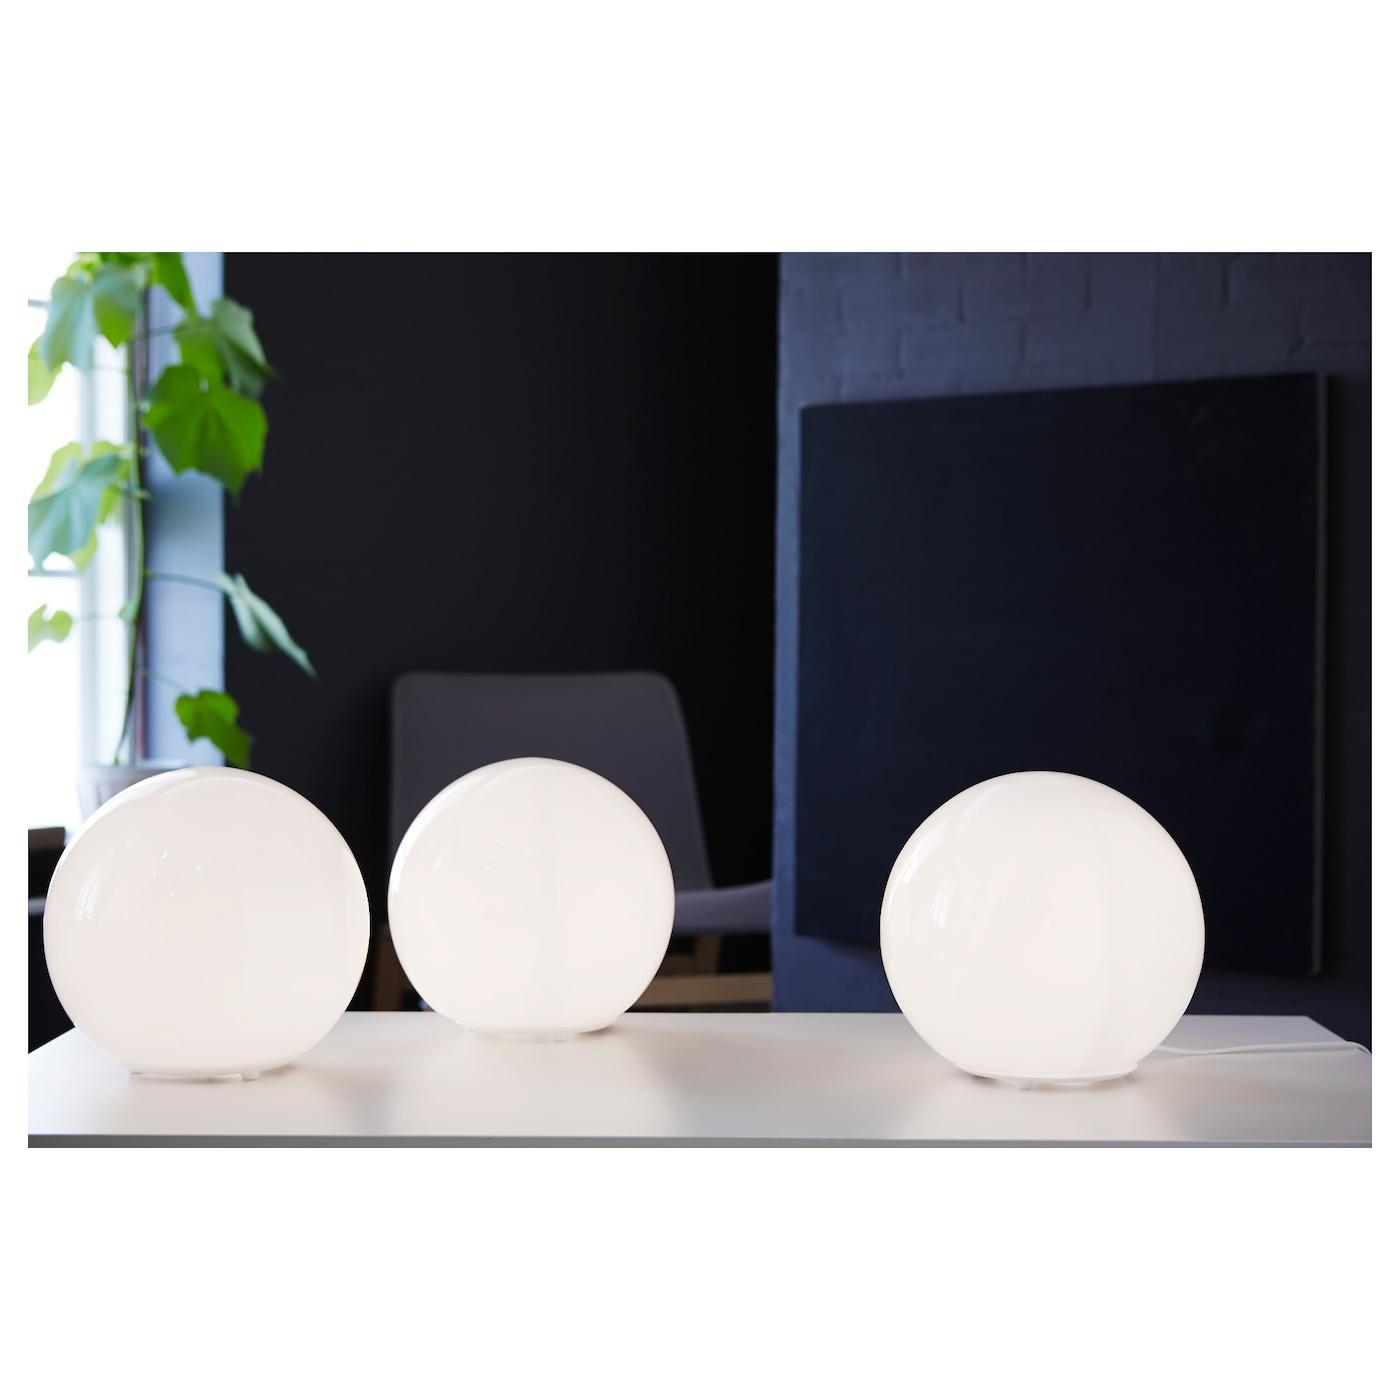 Fado table lamp white ikea ikea fado table lamp creates a soft cosy mood light in your room geotapseo Gallery